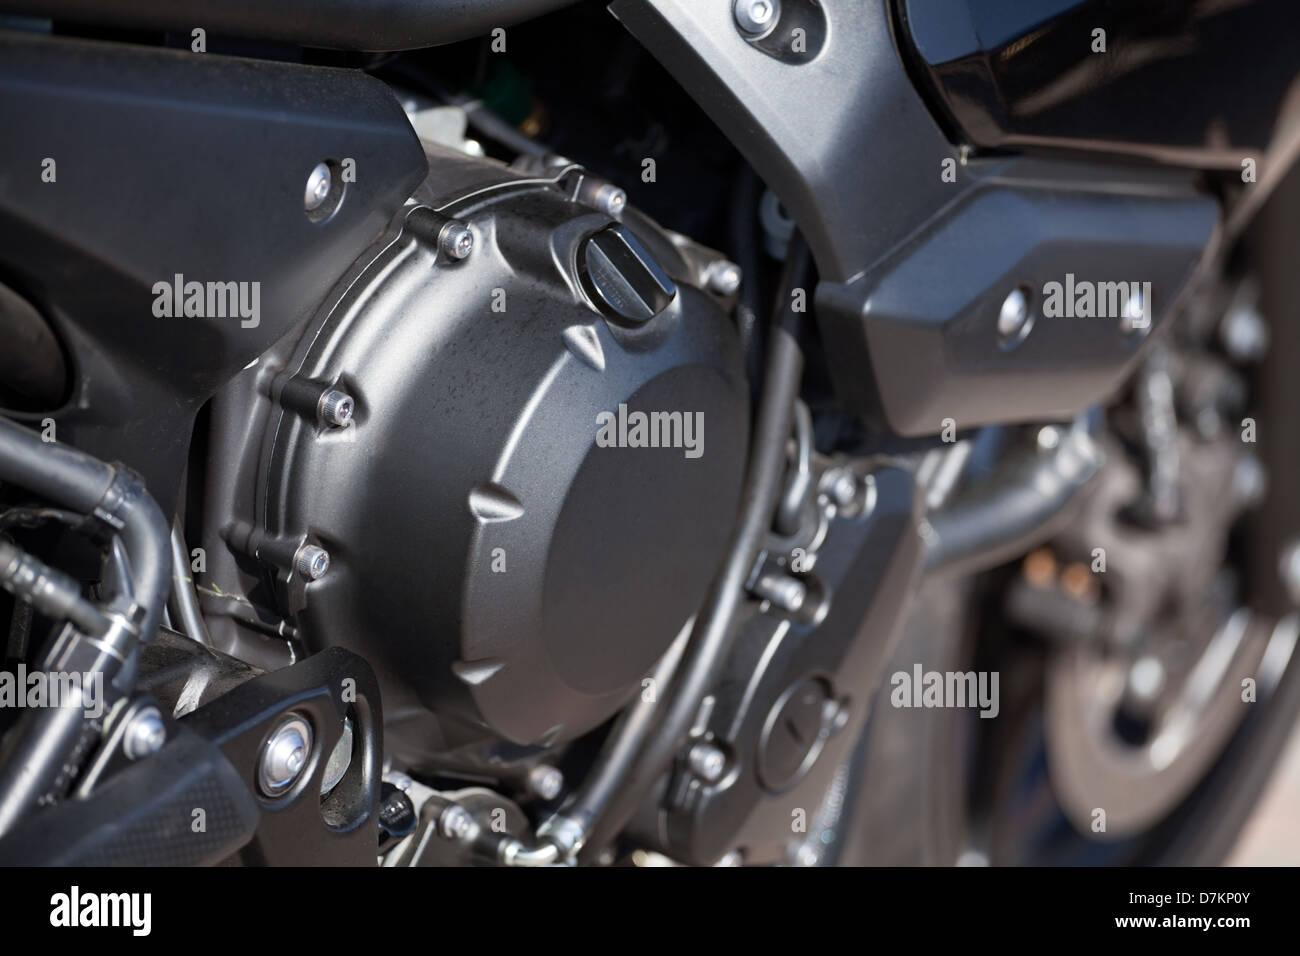 engine motorcycle cylinder closeup detail - Stock Image